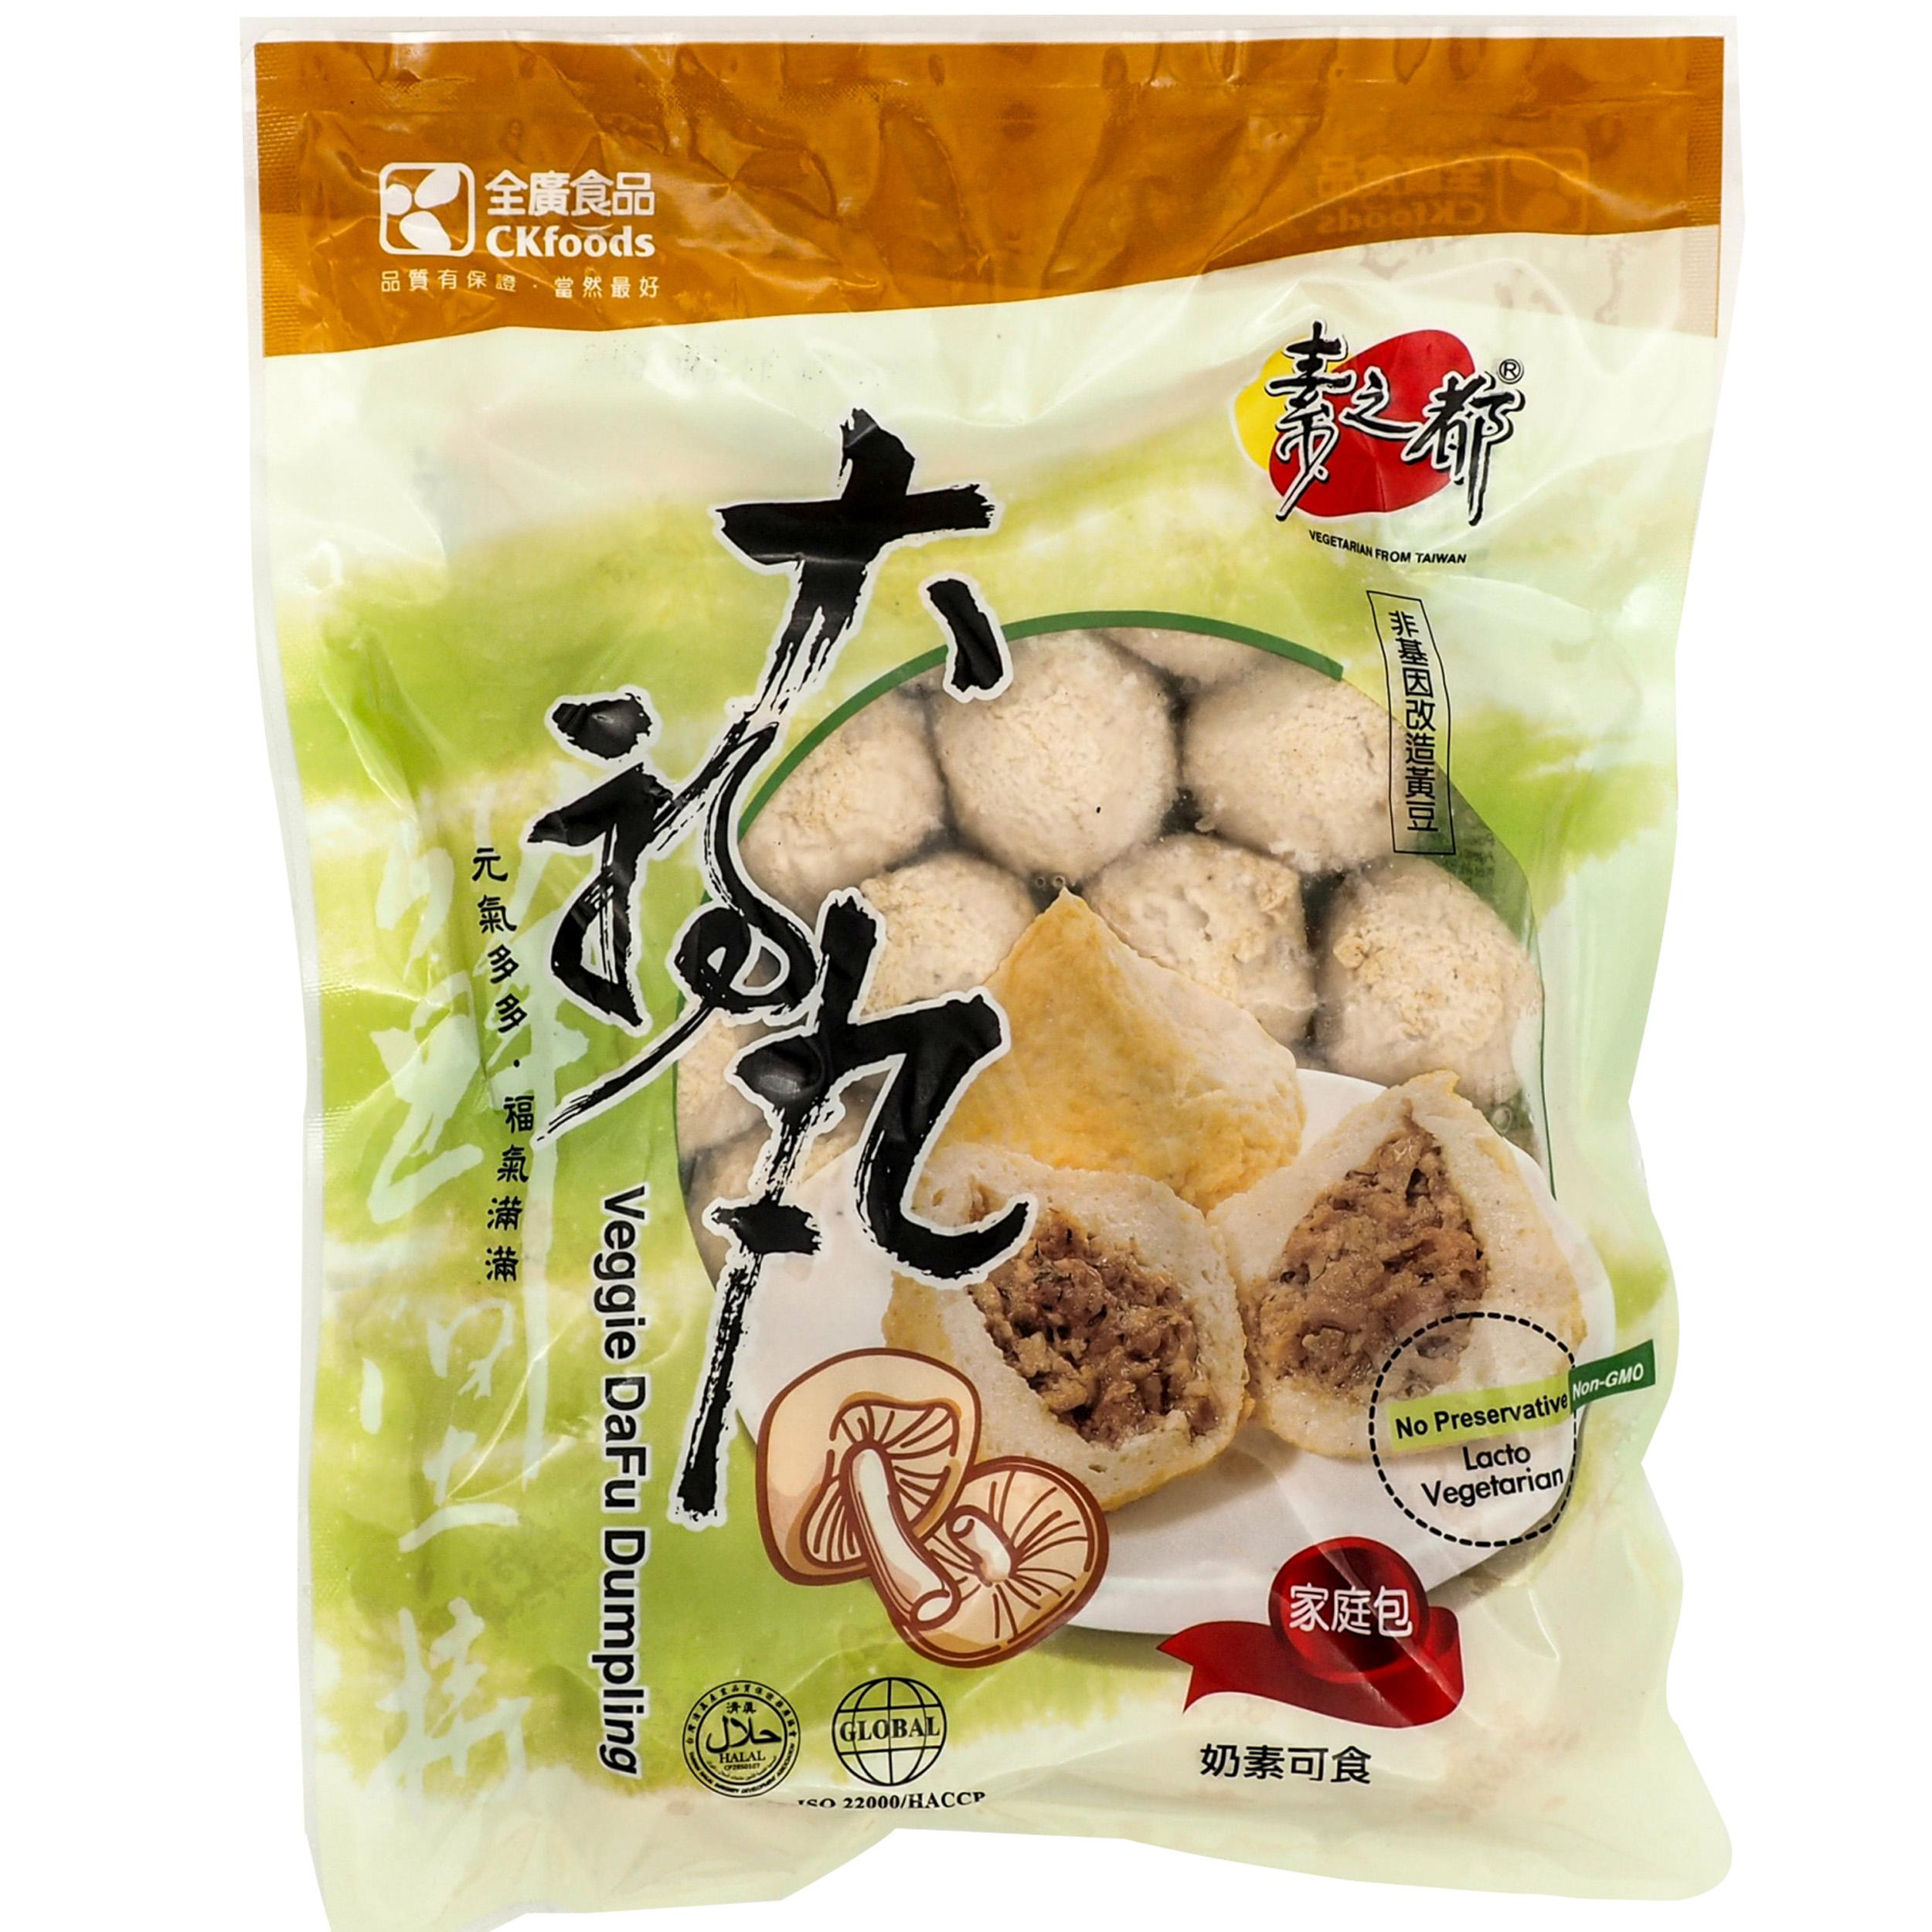 Image Veggie DaFu Da Fu Dumpling 全广-大福丸 600 grams